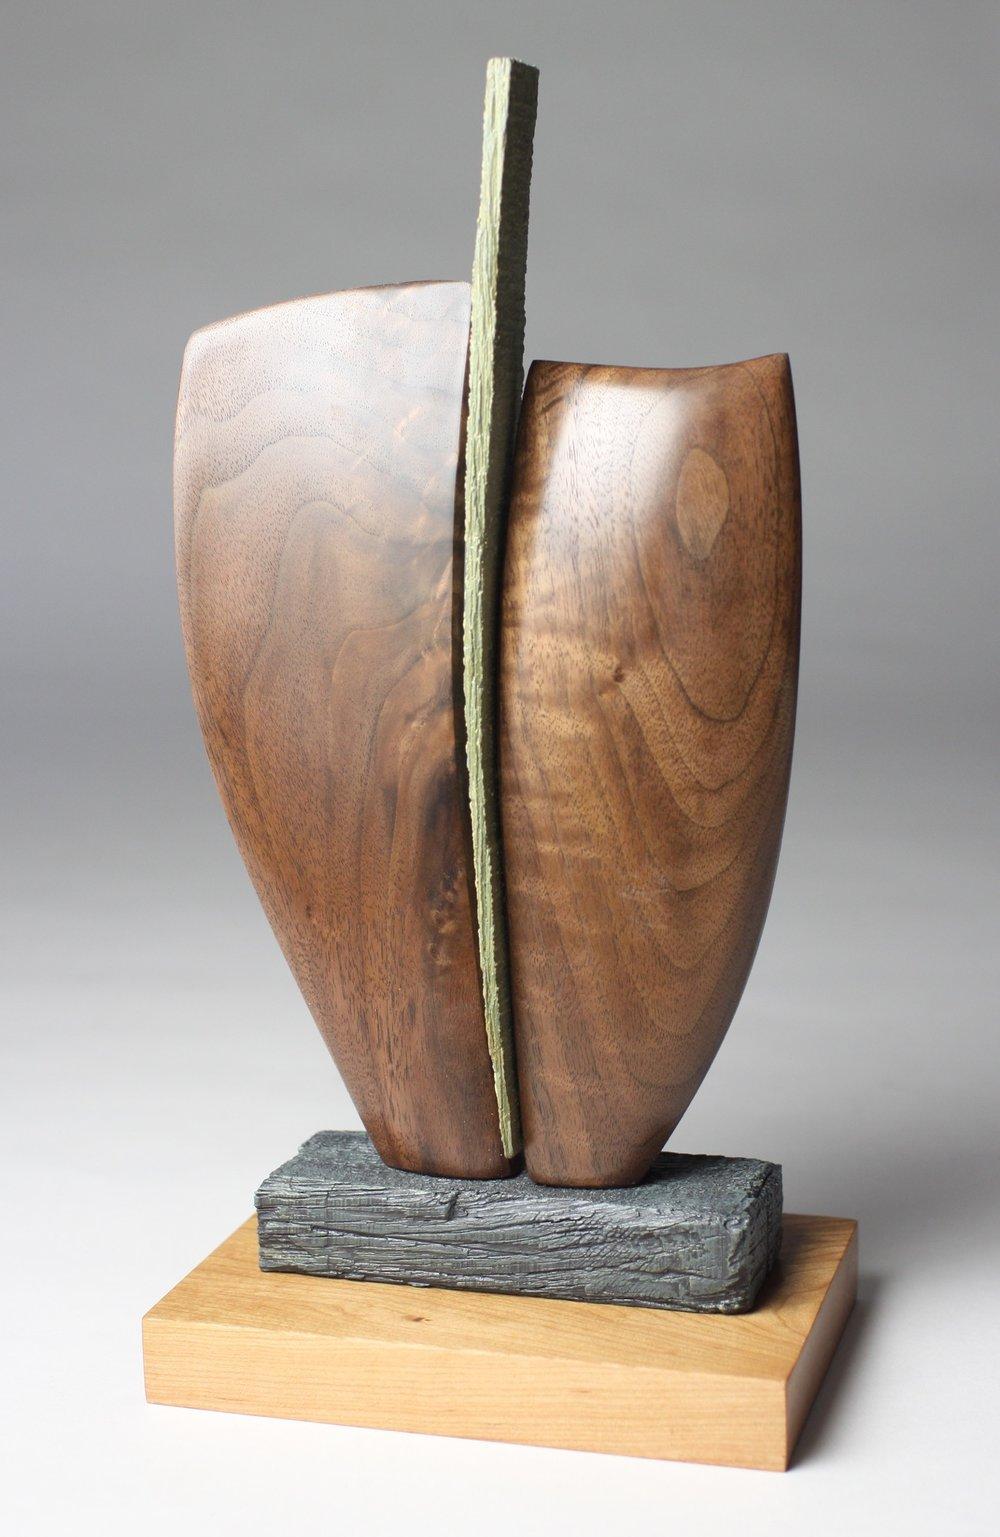 Sculpture #2 (view 1)